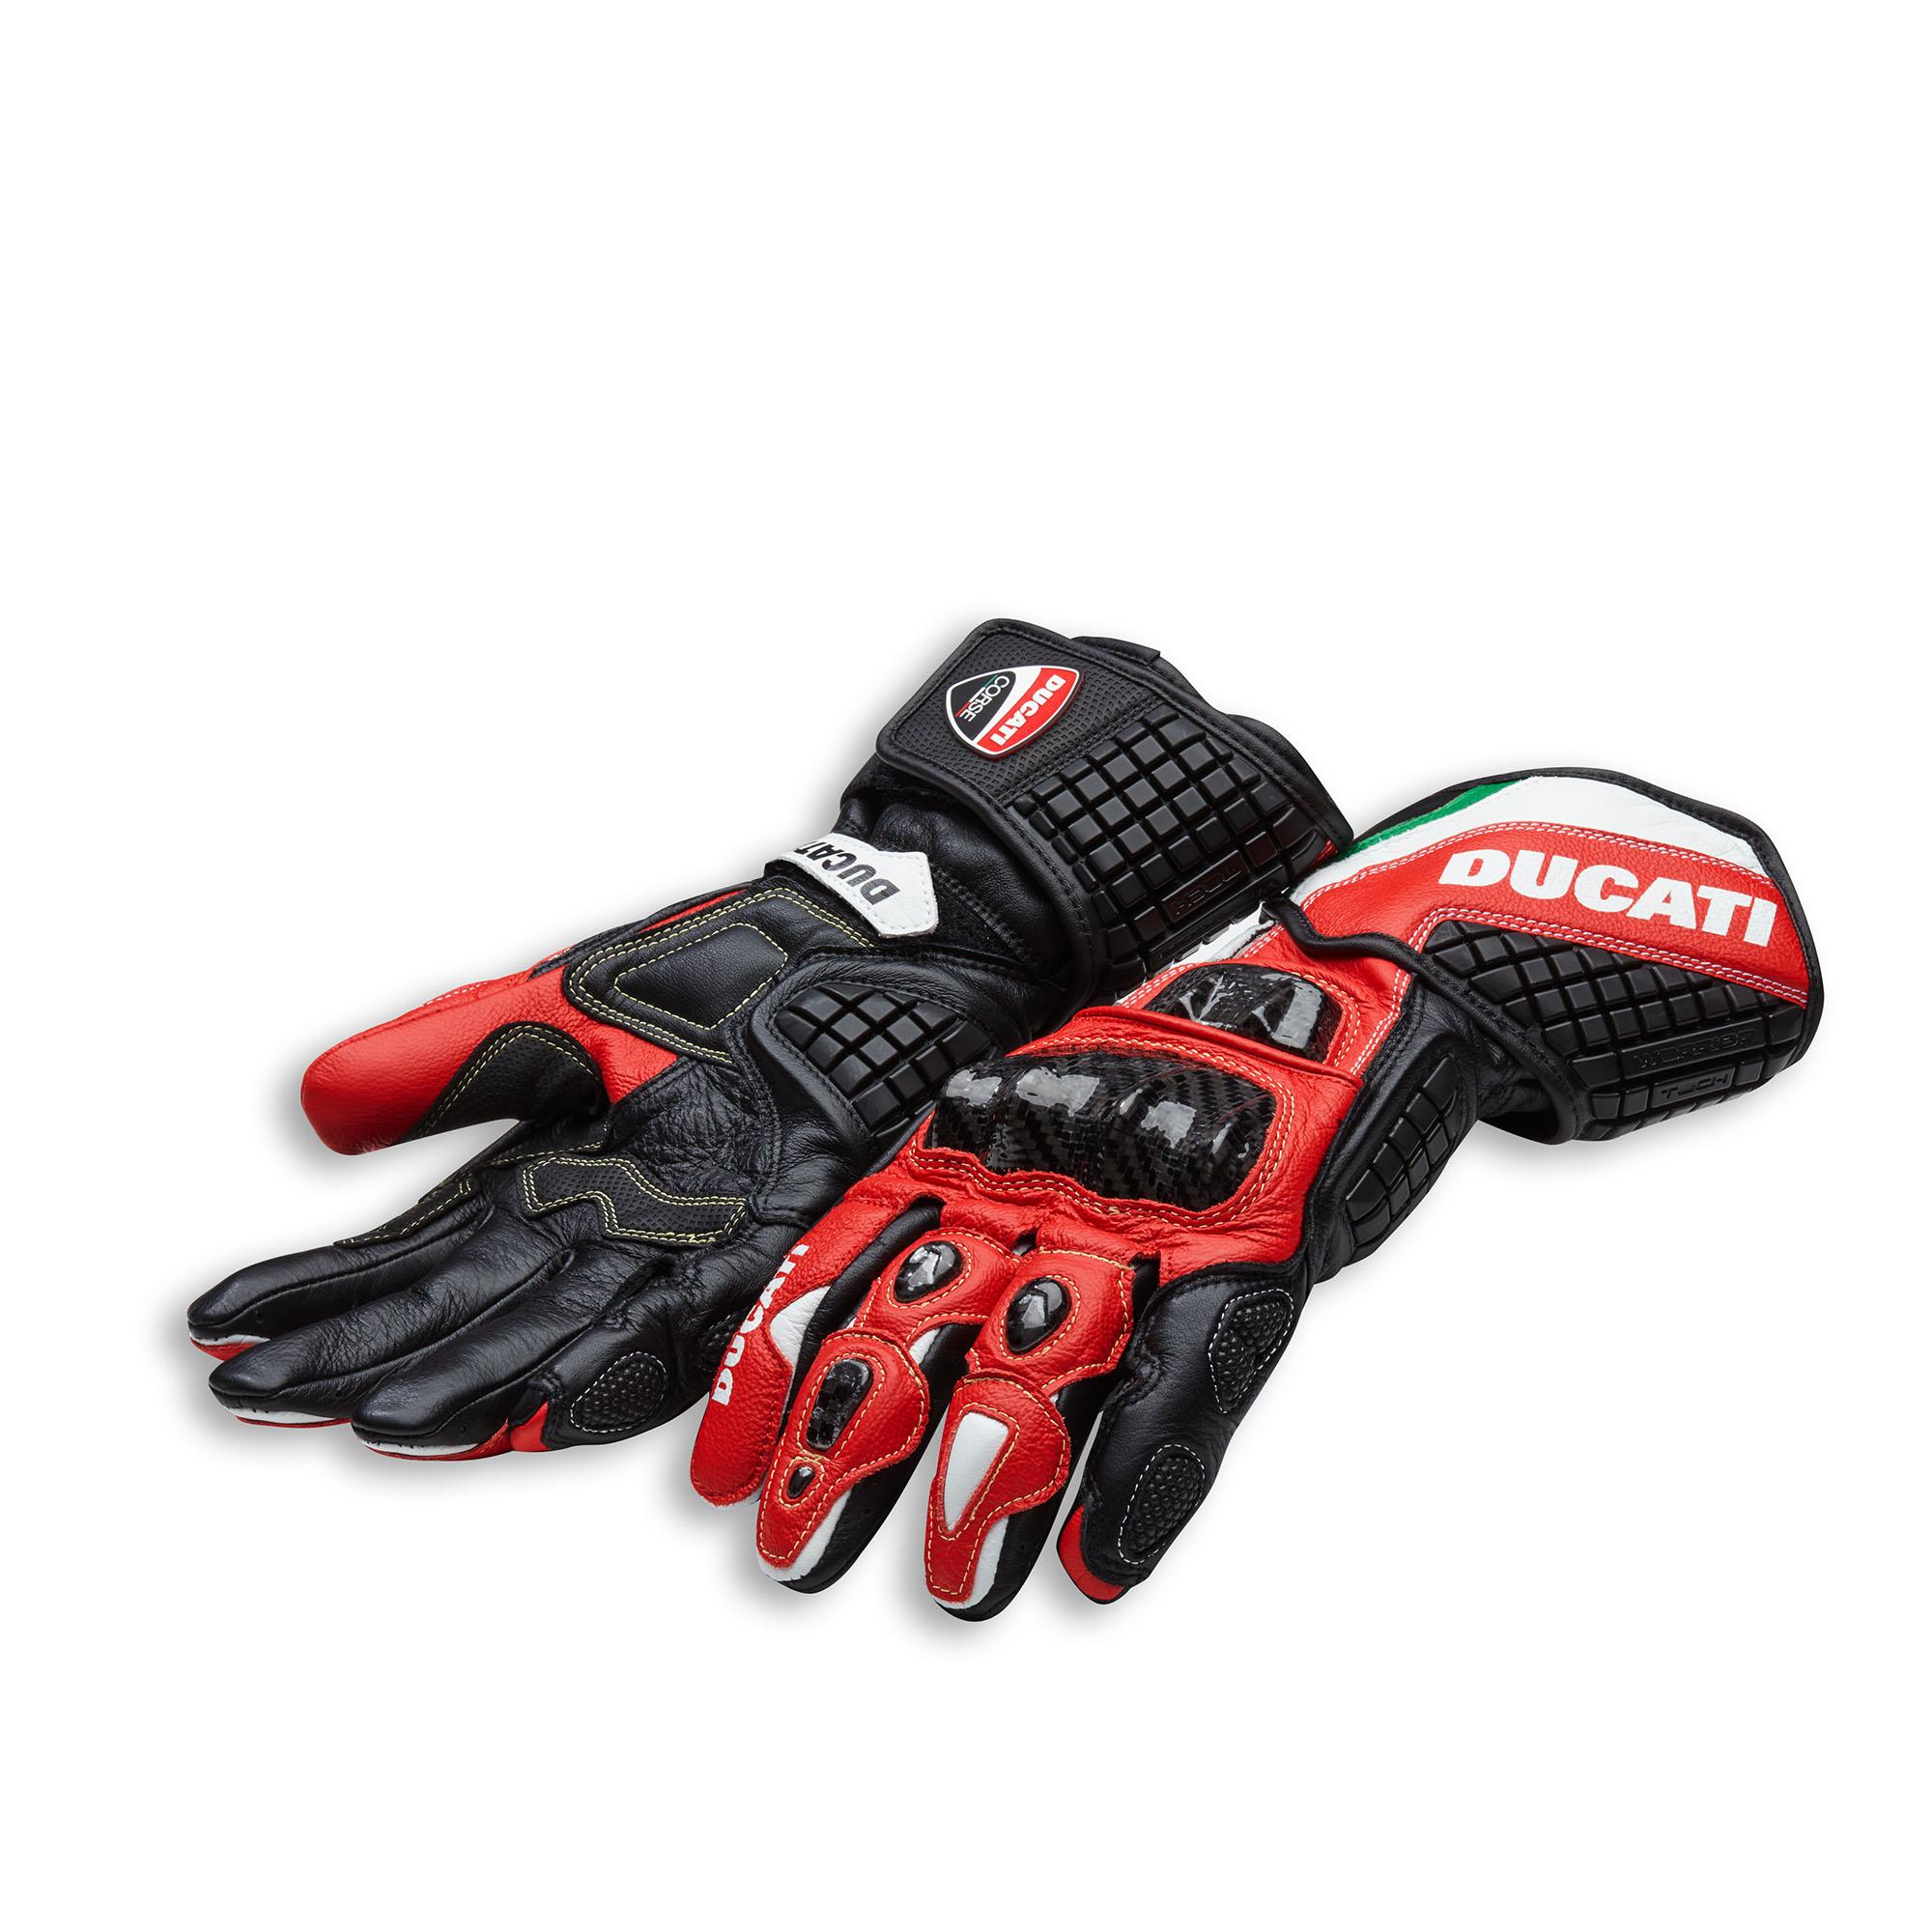 Ducati Corse C3 Leather gloves 981042163